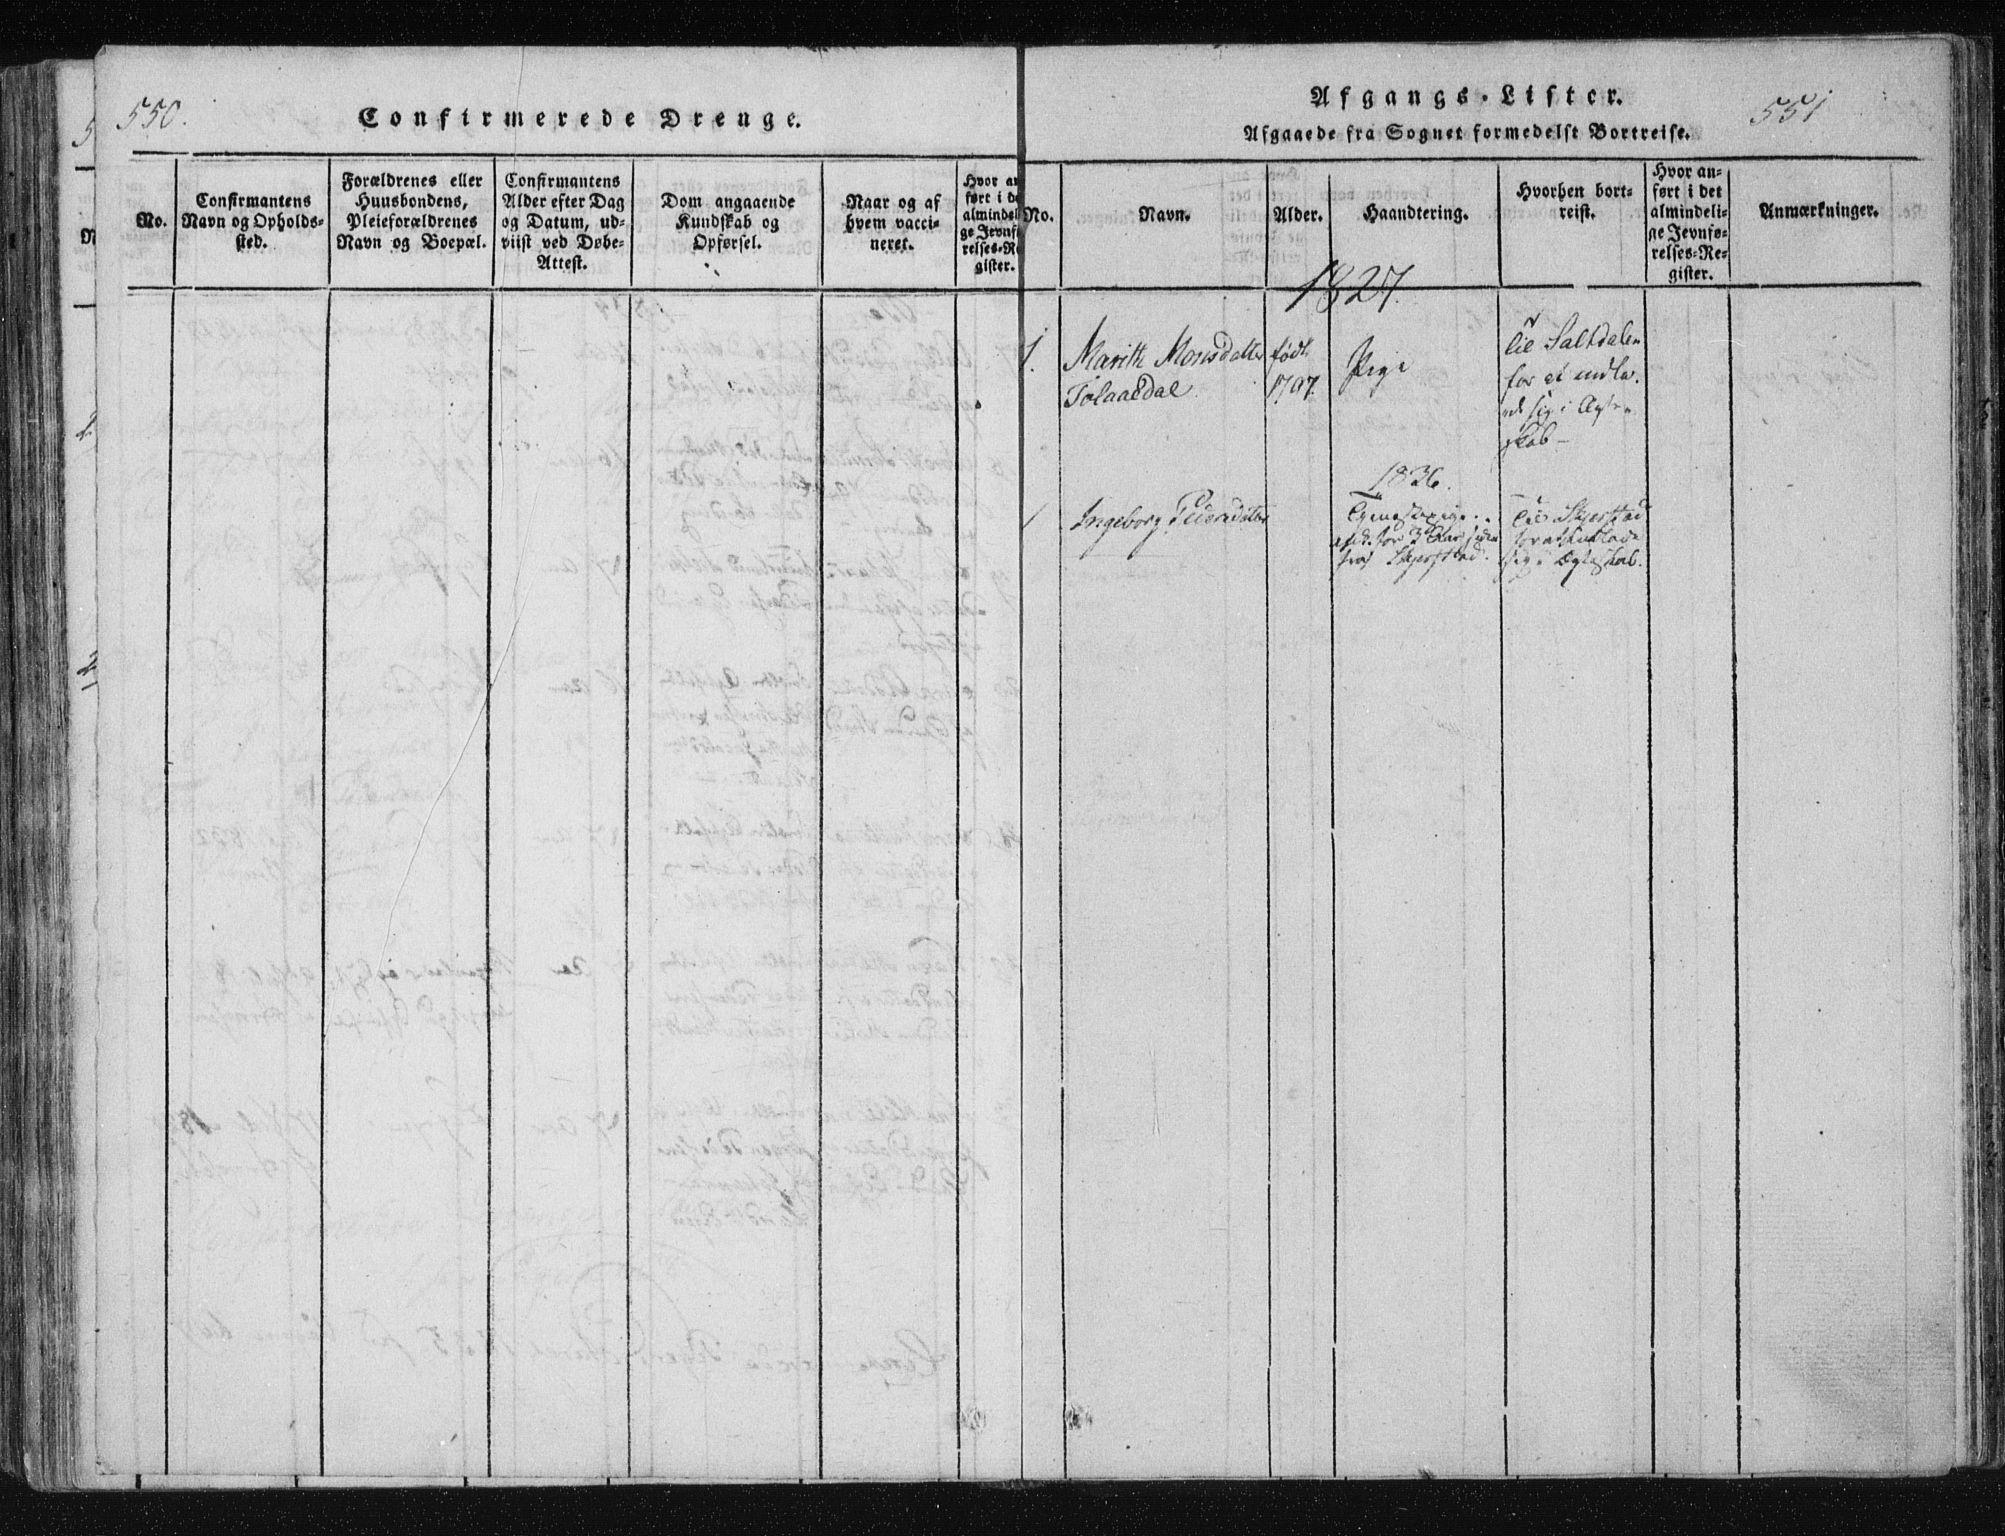 SAT, Ministerialprotokoller, klokkerbøker og fødselsregistre - Nordland, 805/L0096: Ministerialbok nr. 805A03, 1820-1837, s. 550-551